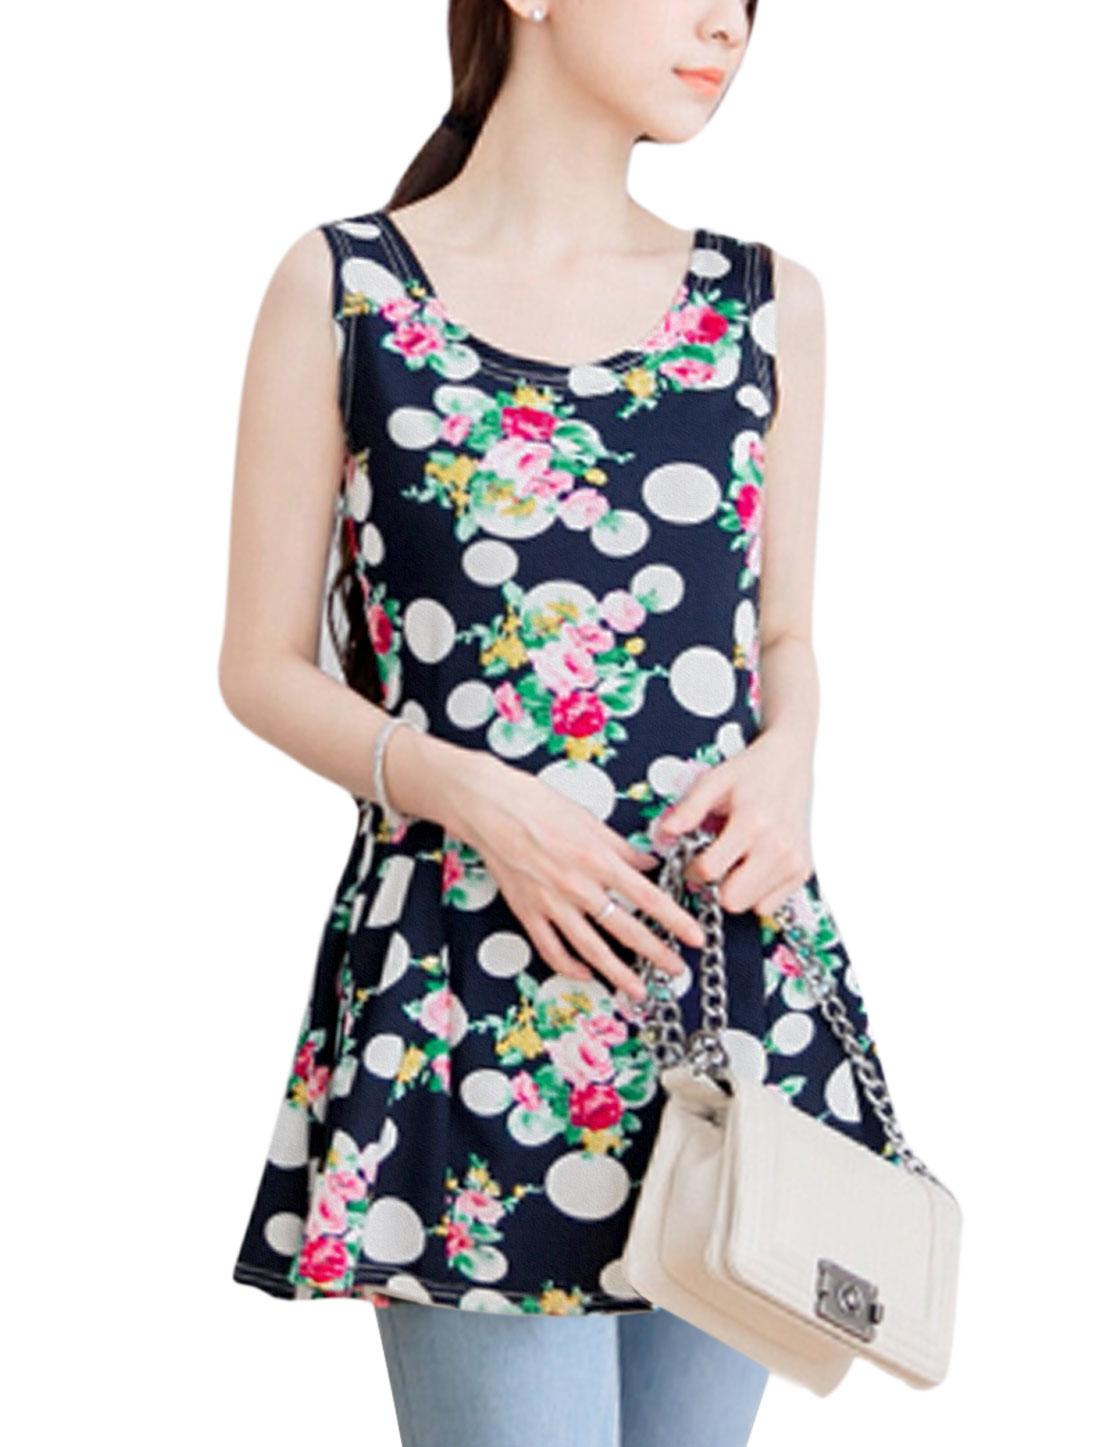 Woman Floral Polka Dots Prints Slipover Tunic Peplum Top Navy Blues M